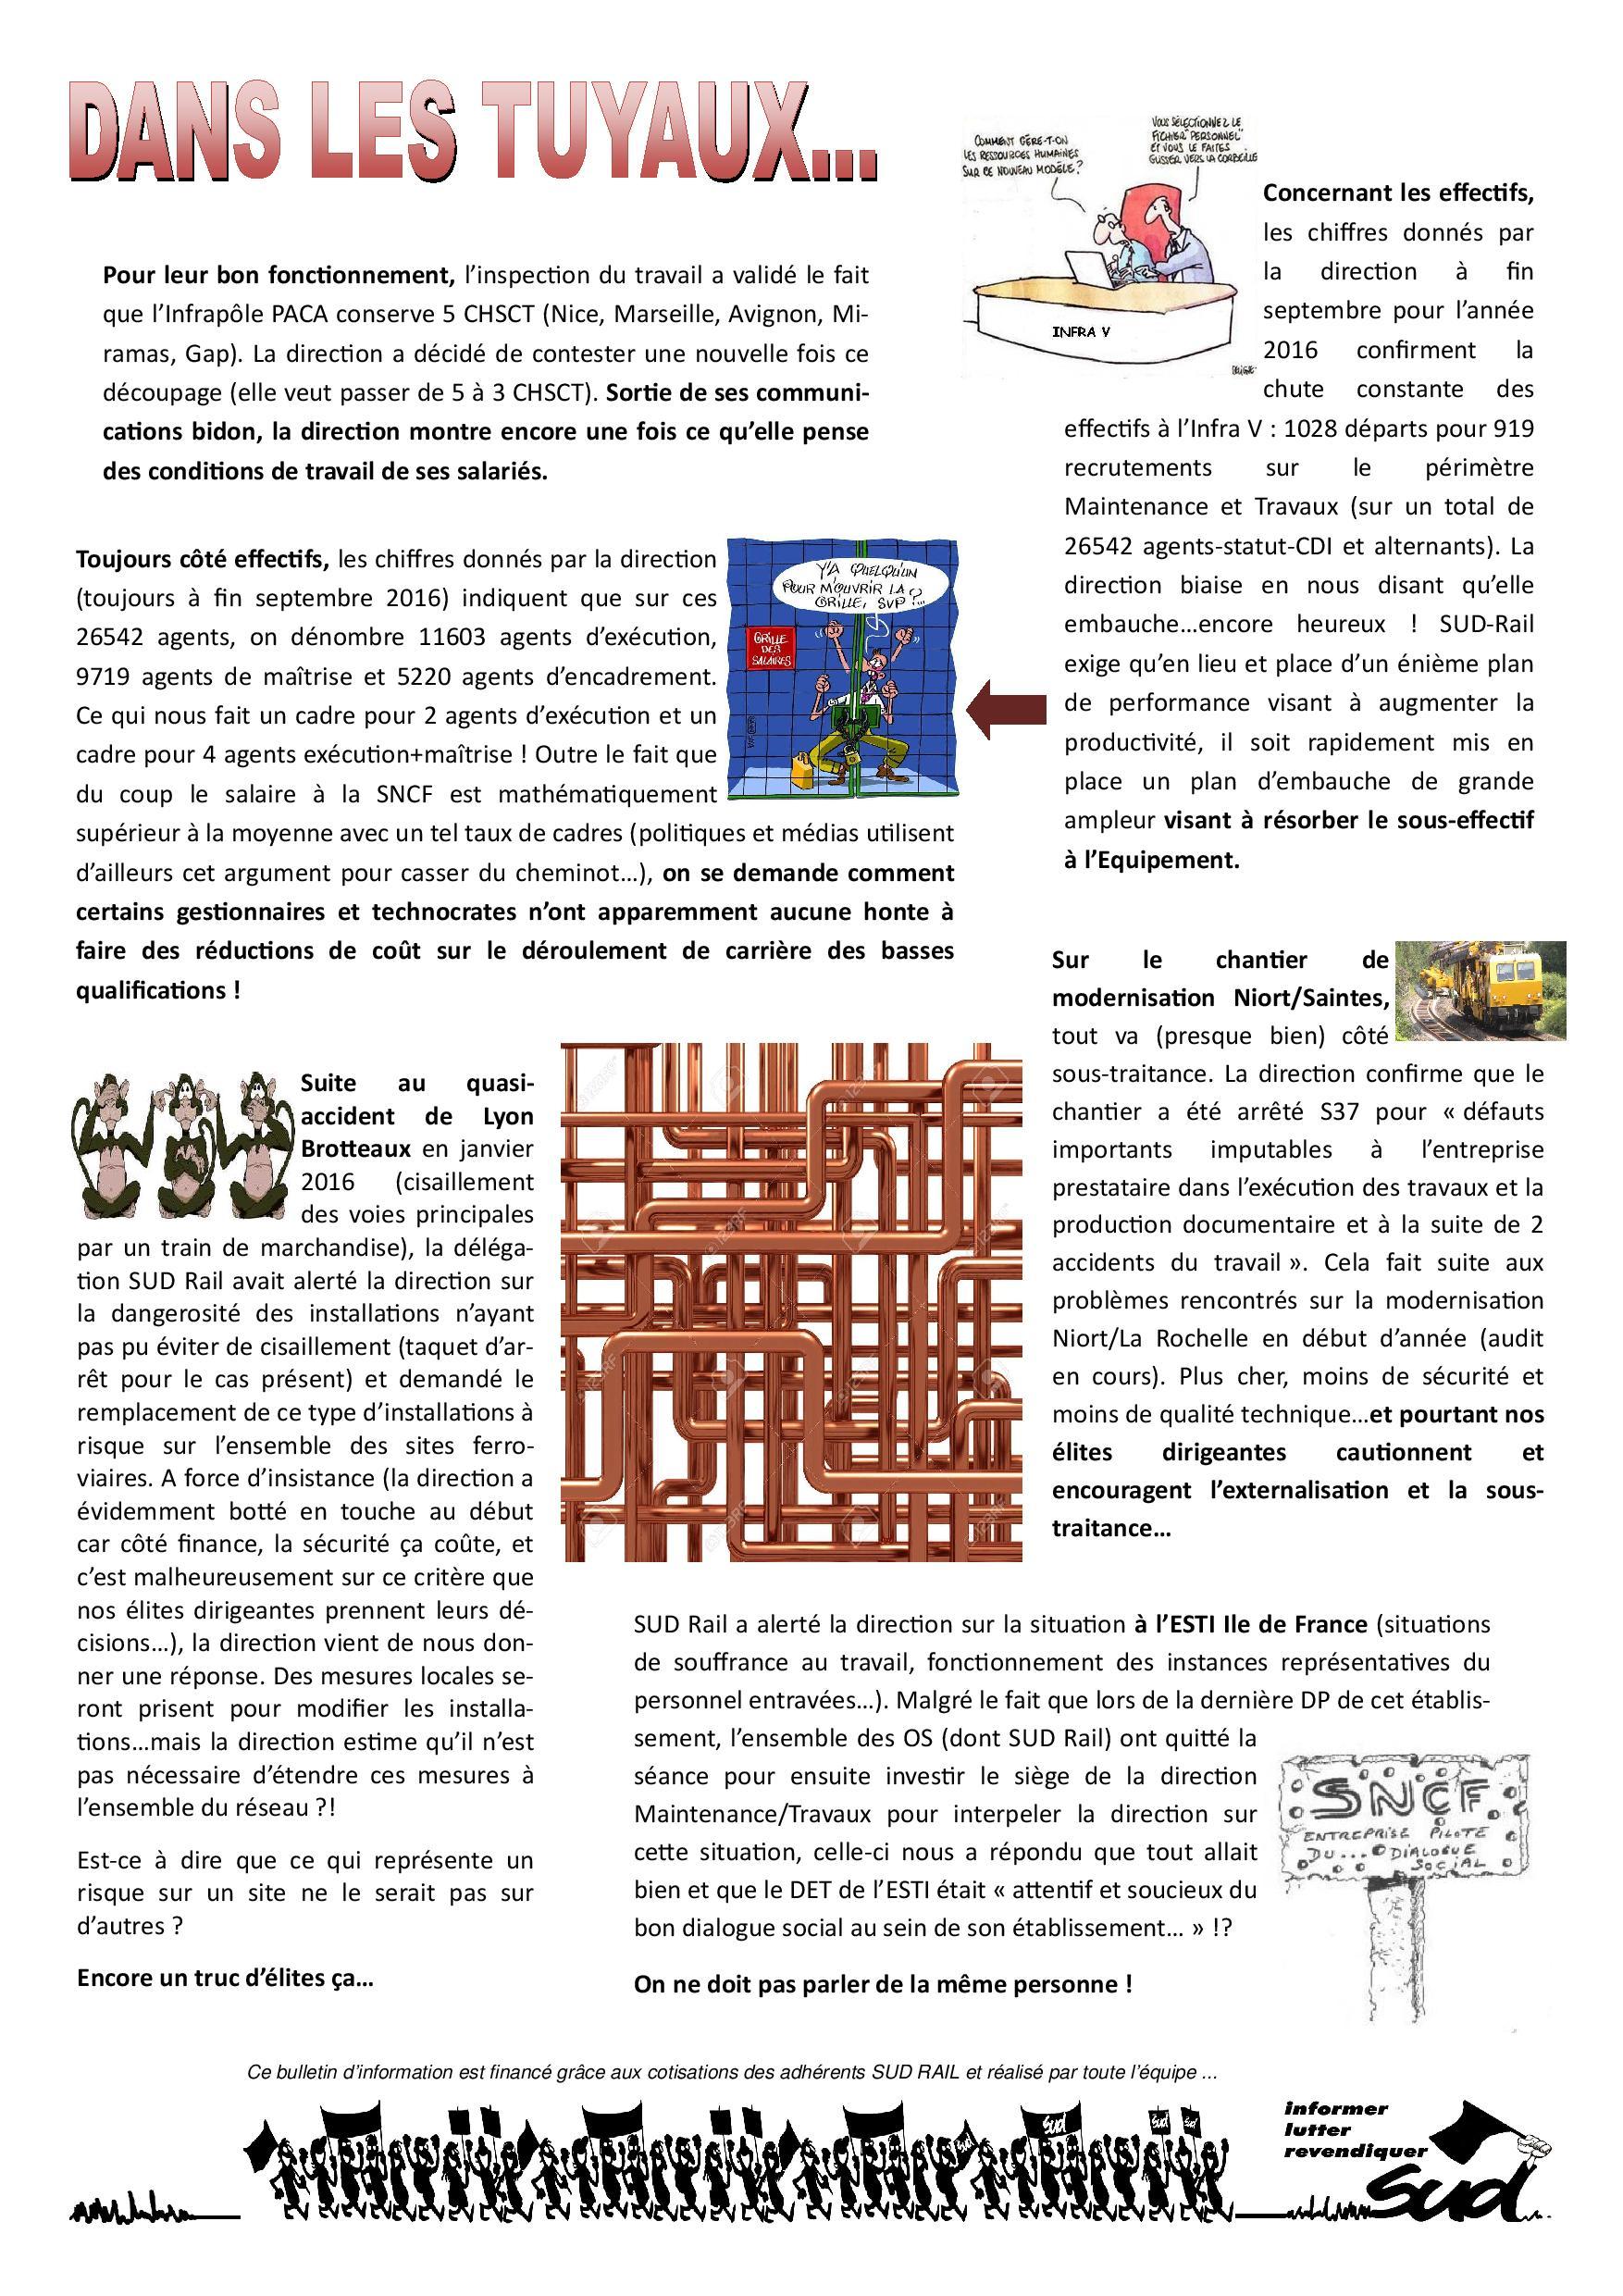 cr-ce-mt-20-10-2010-page-003